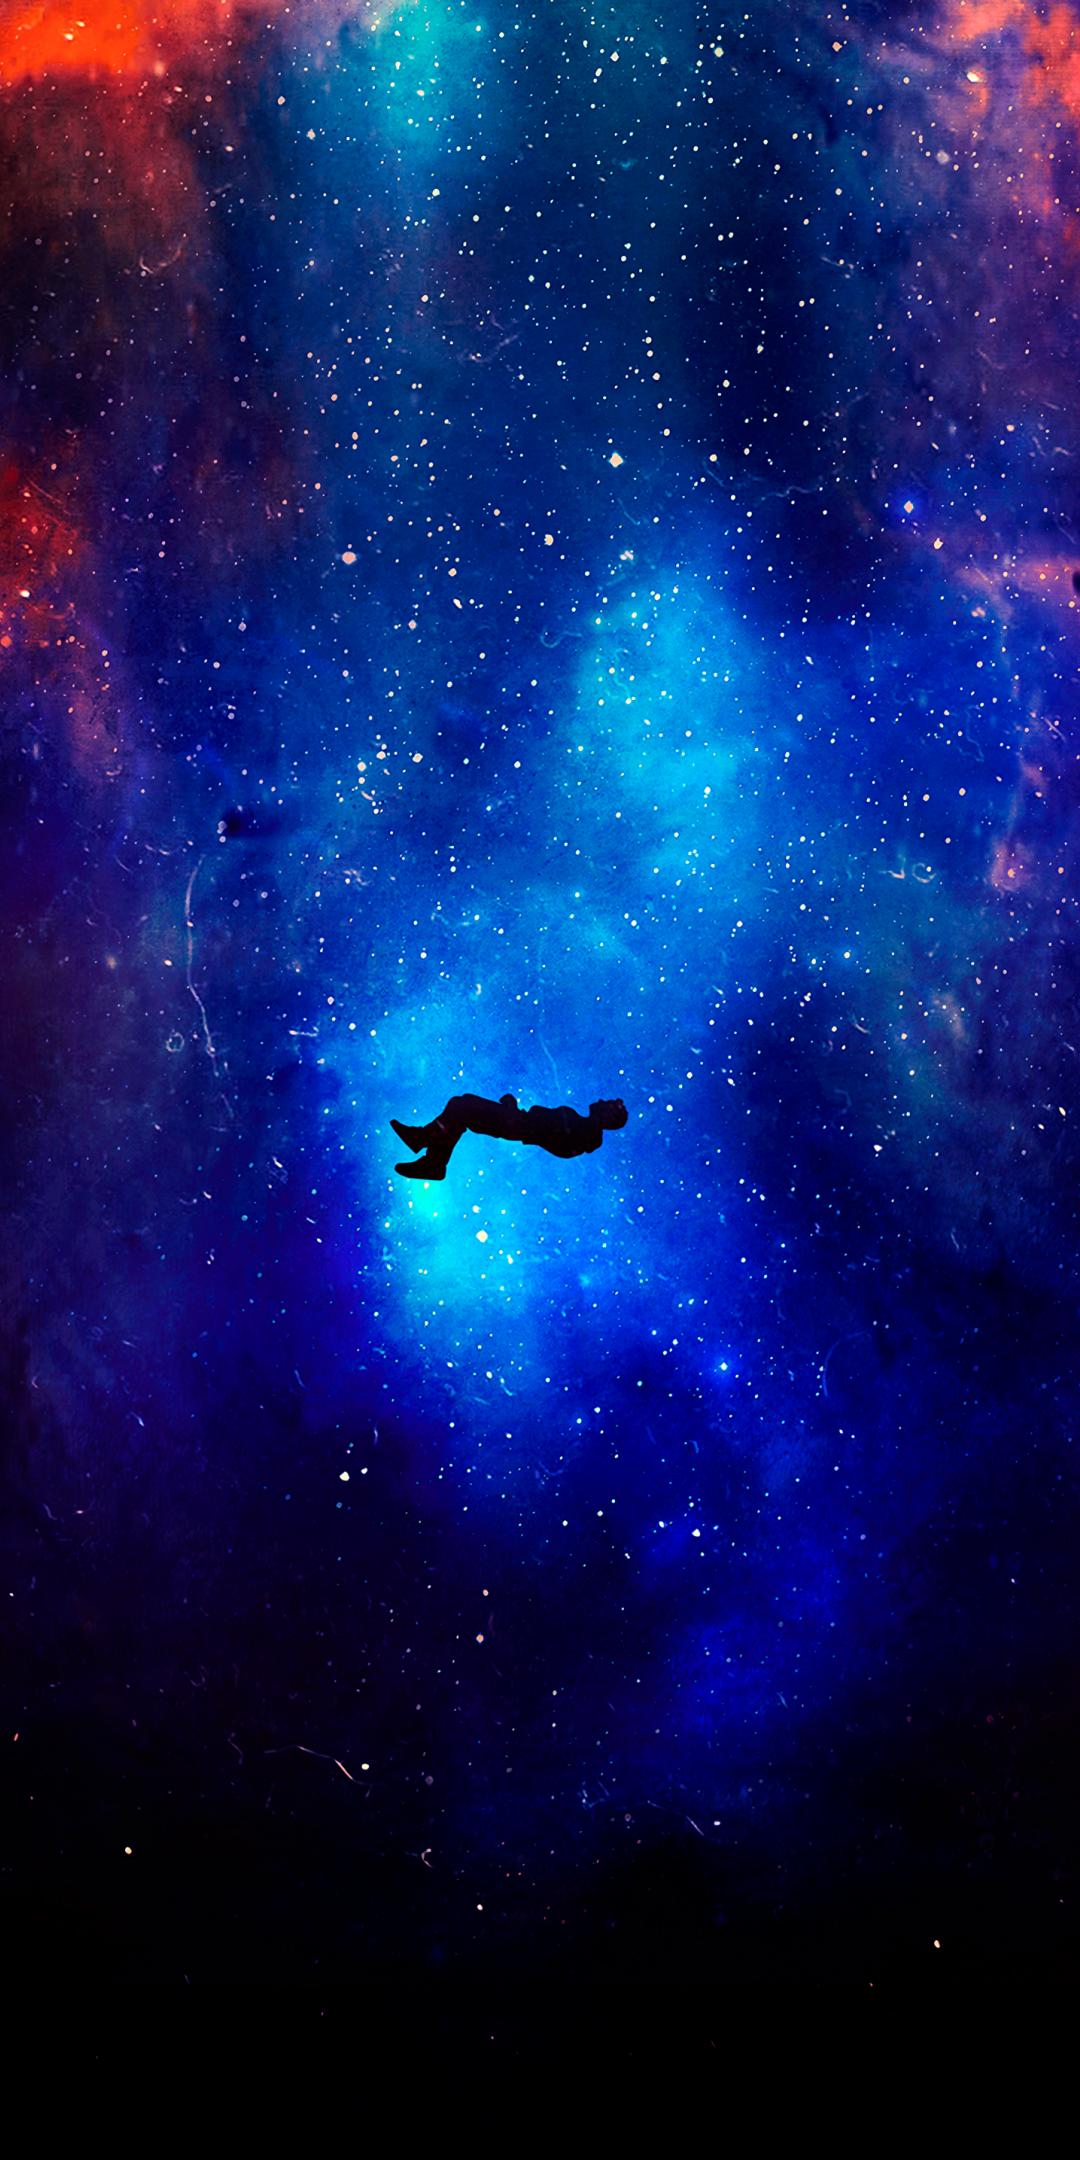 Silhouette Levitation Space Cosmos Fantasy 1080x2160 Wallpaper Space Iphone Wallpaper Wallpaper Space Art Wallpaper